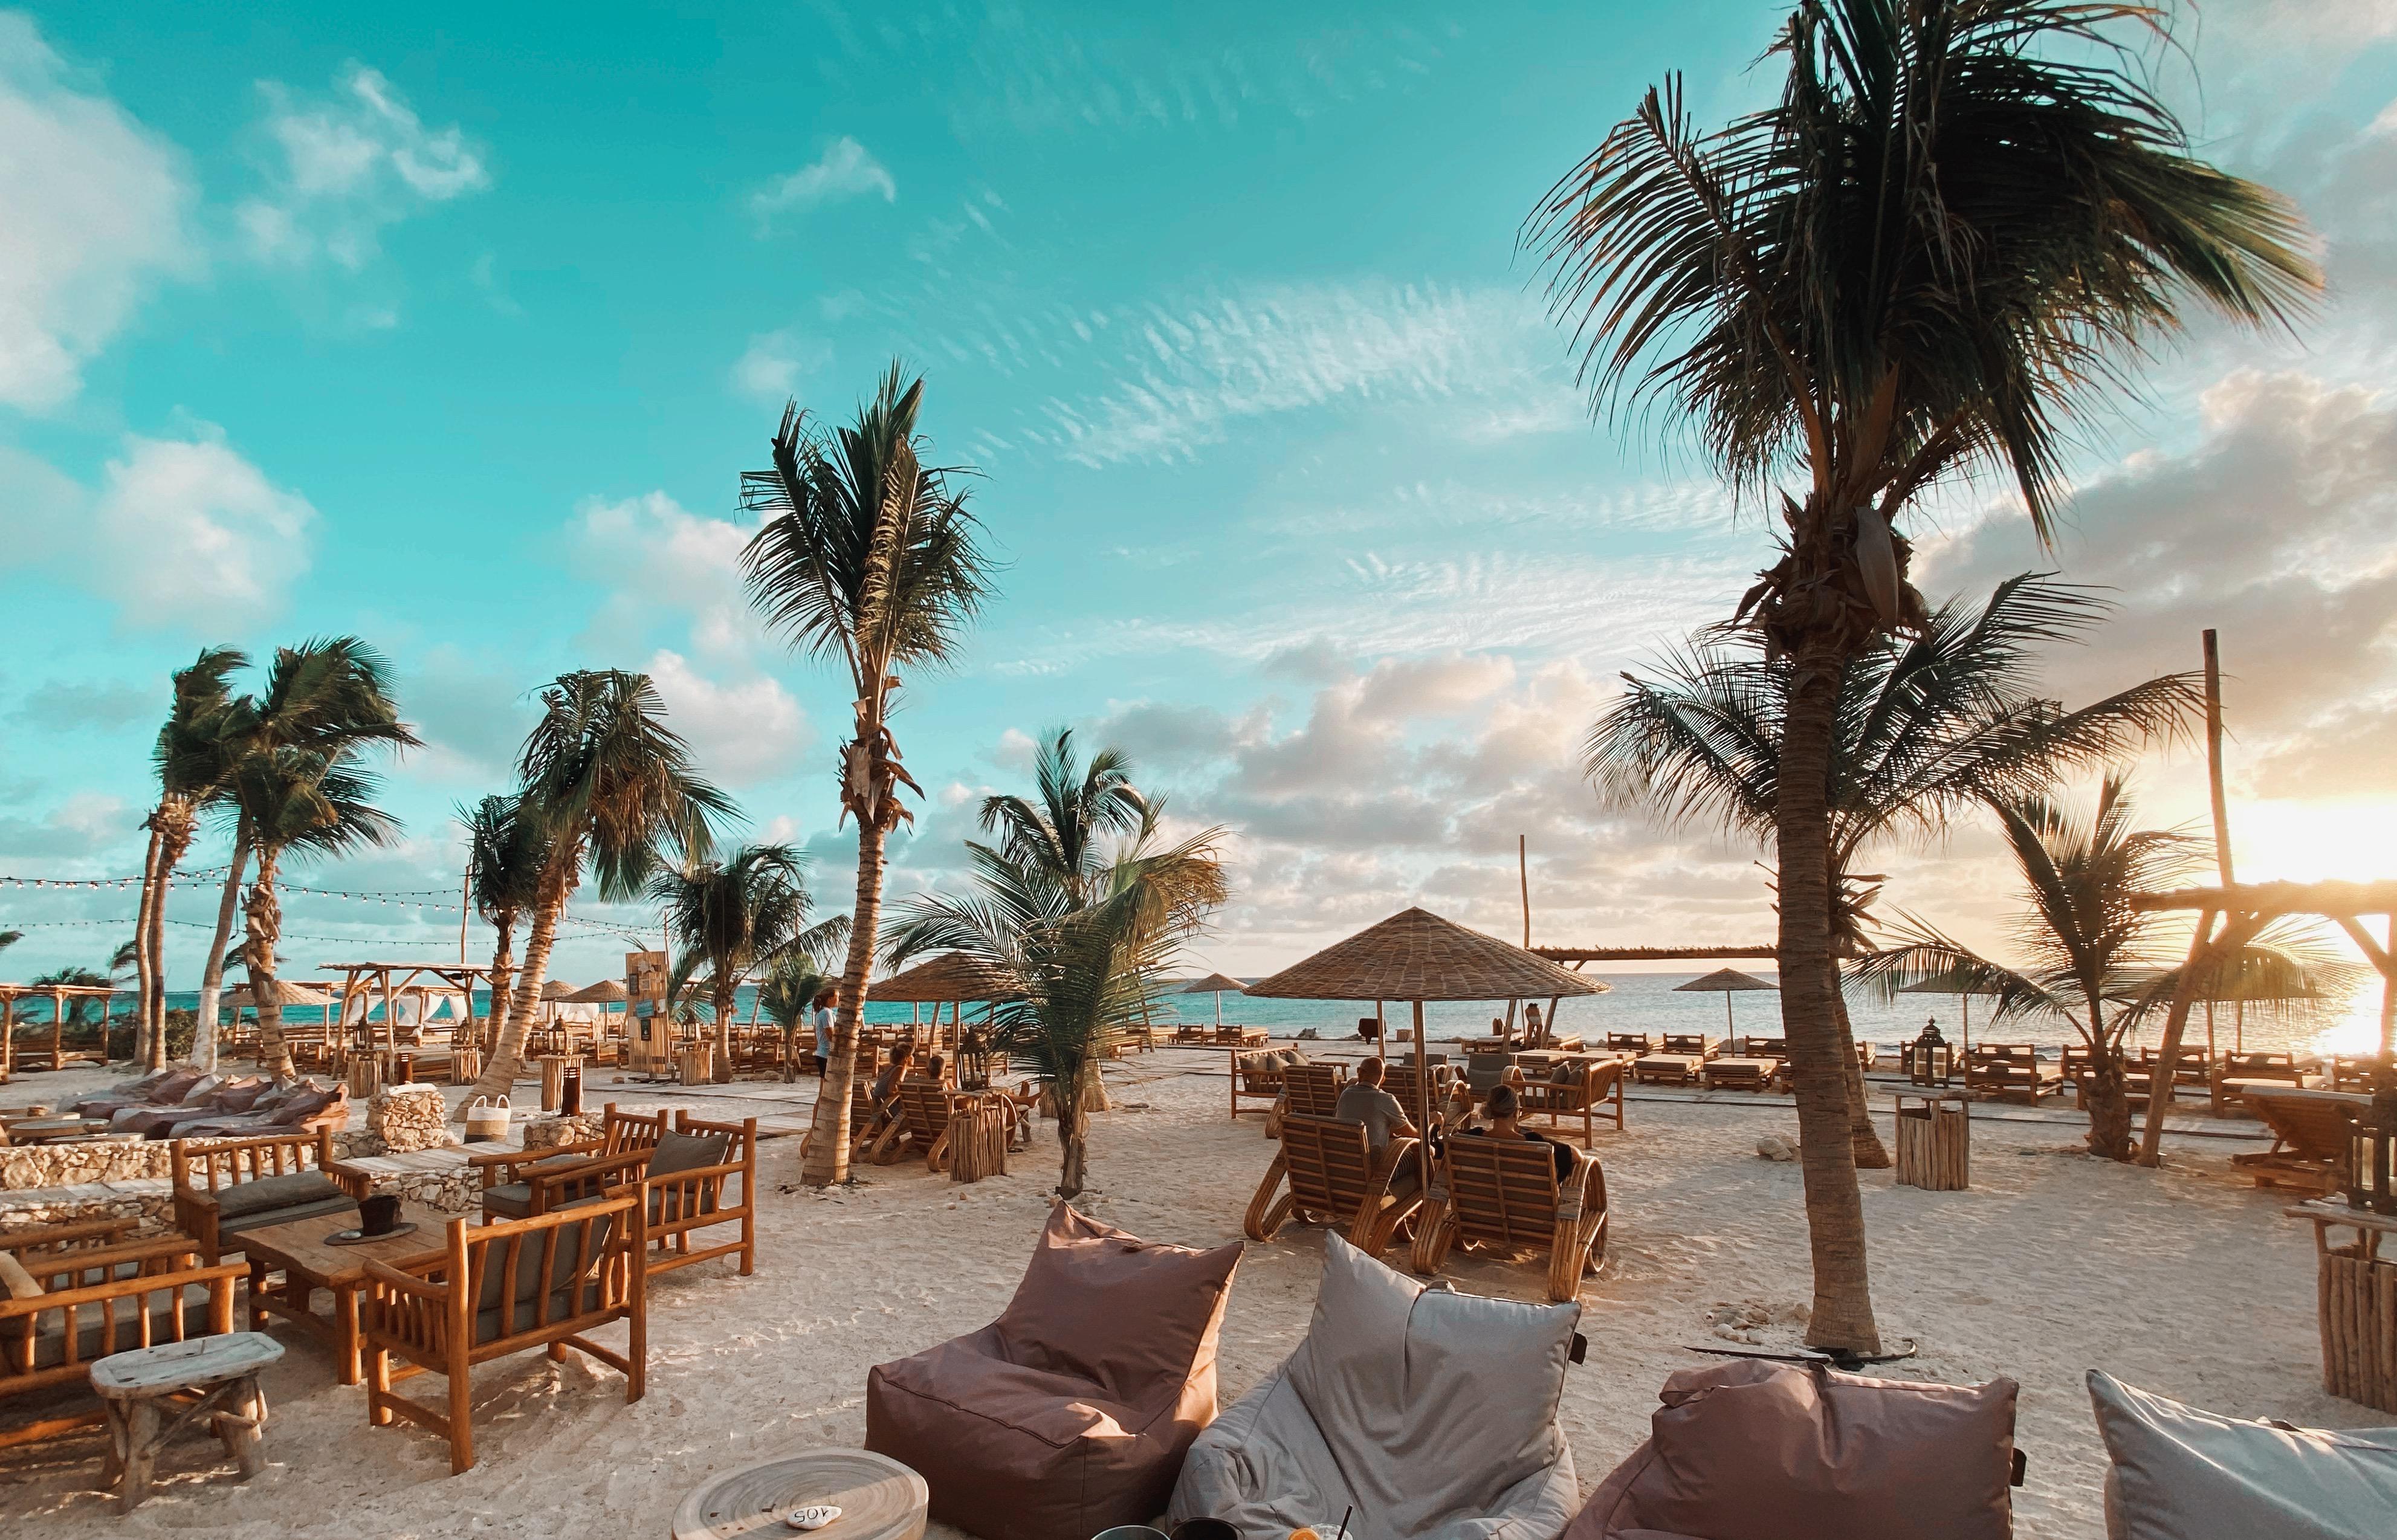 Golden Hour Ocean Oasis Beach Club Bonaire